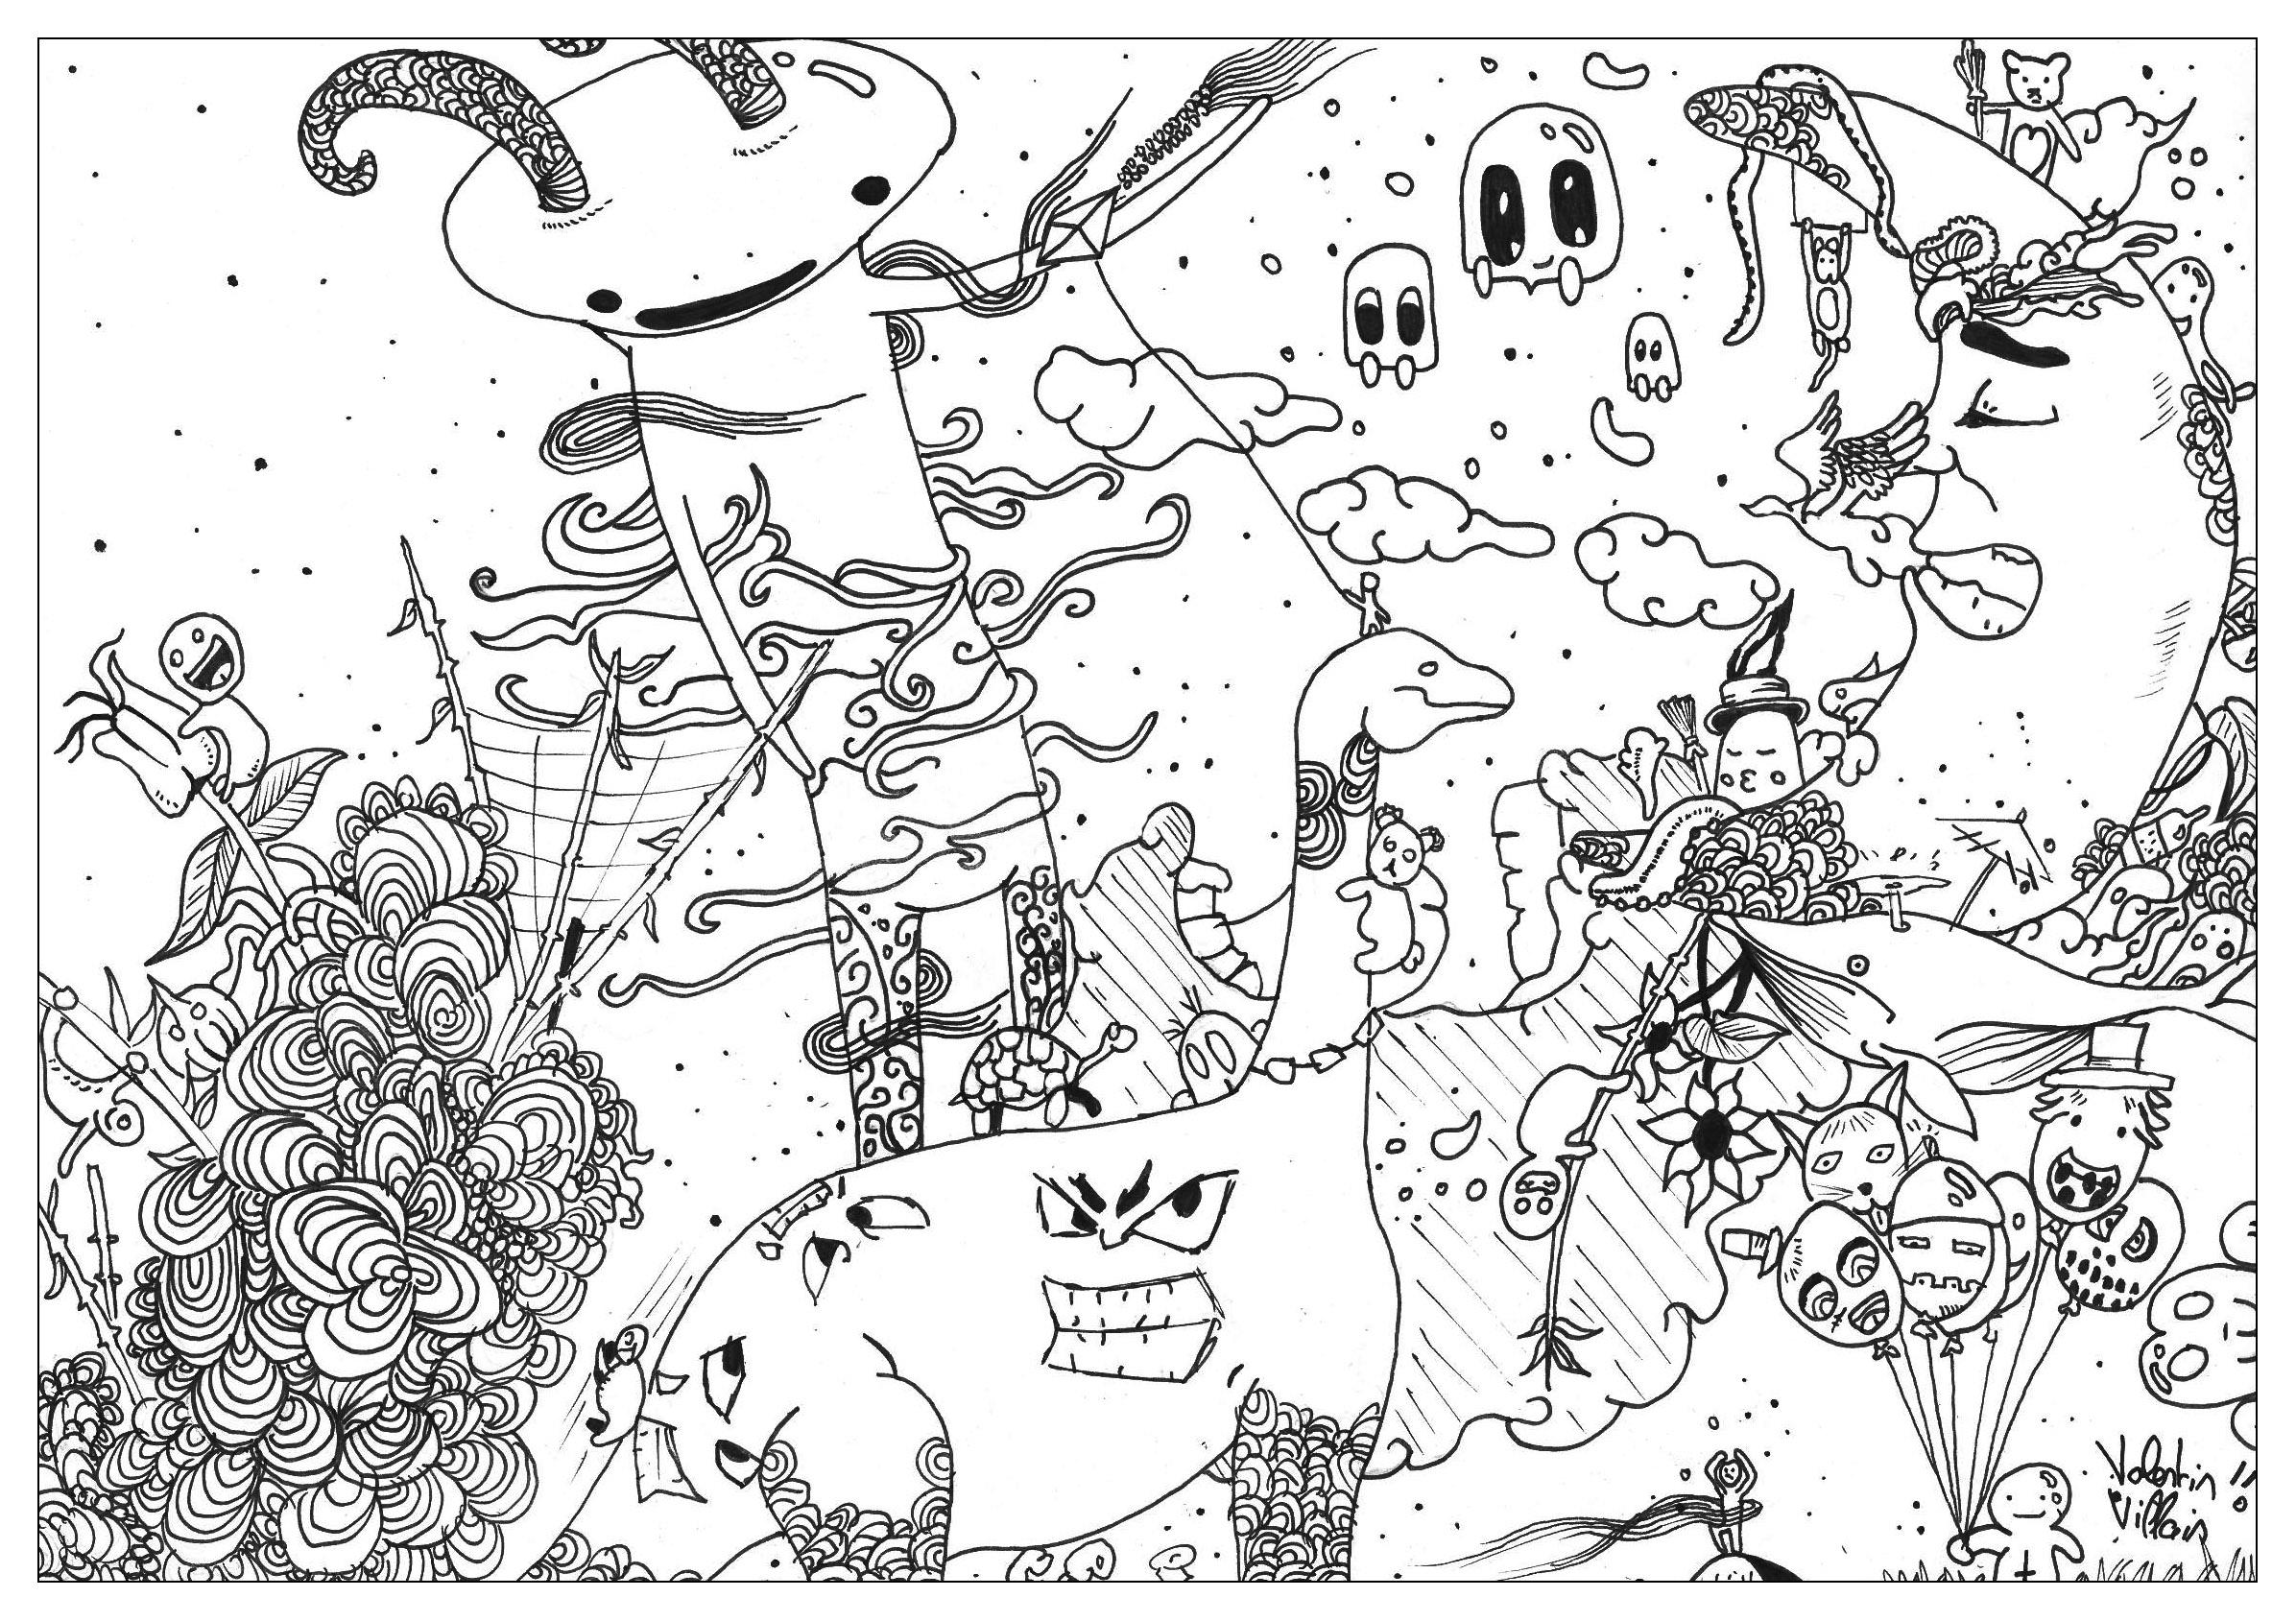 Doodle art doodling 68886